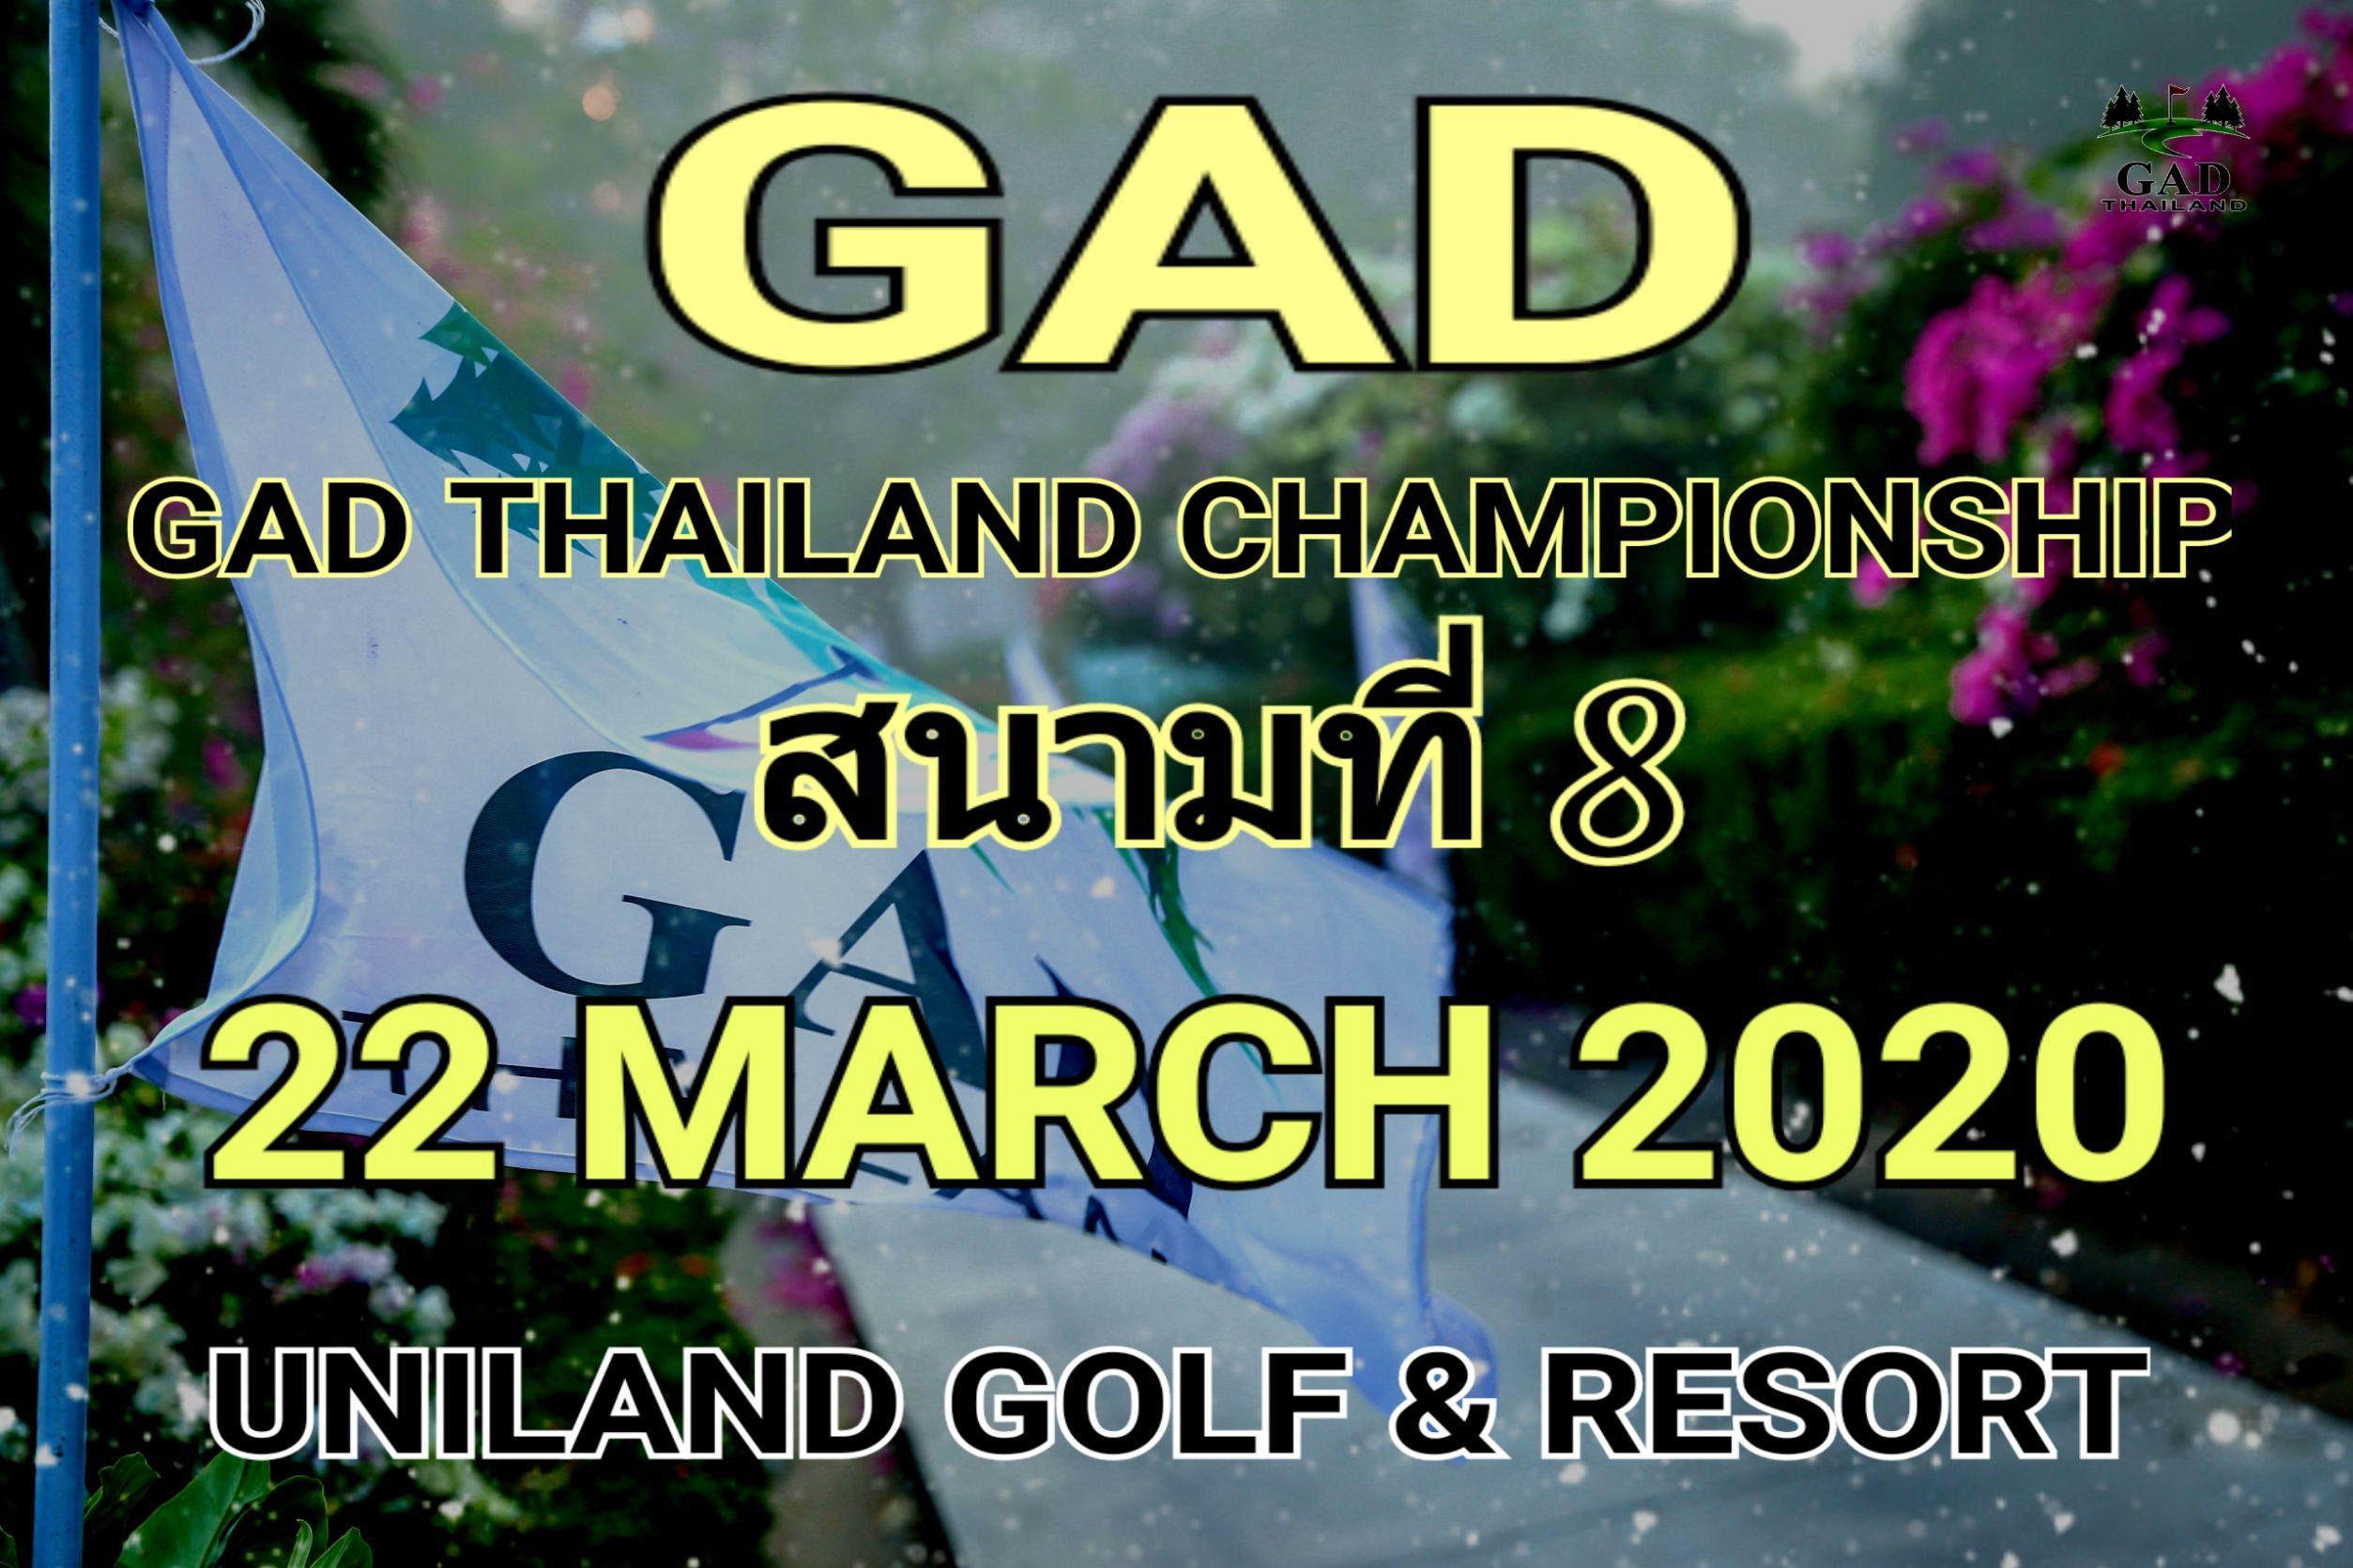 GAD Thailand Championship Match 8 Uniland Golf & Resort